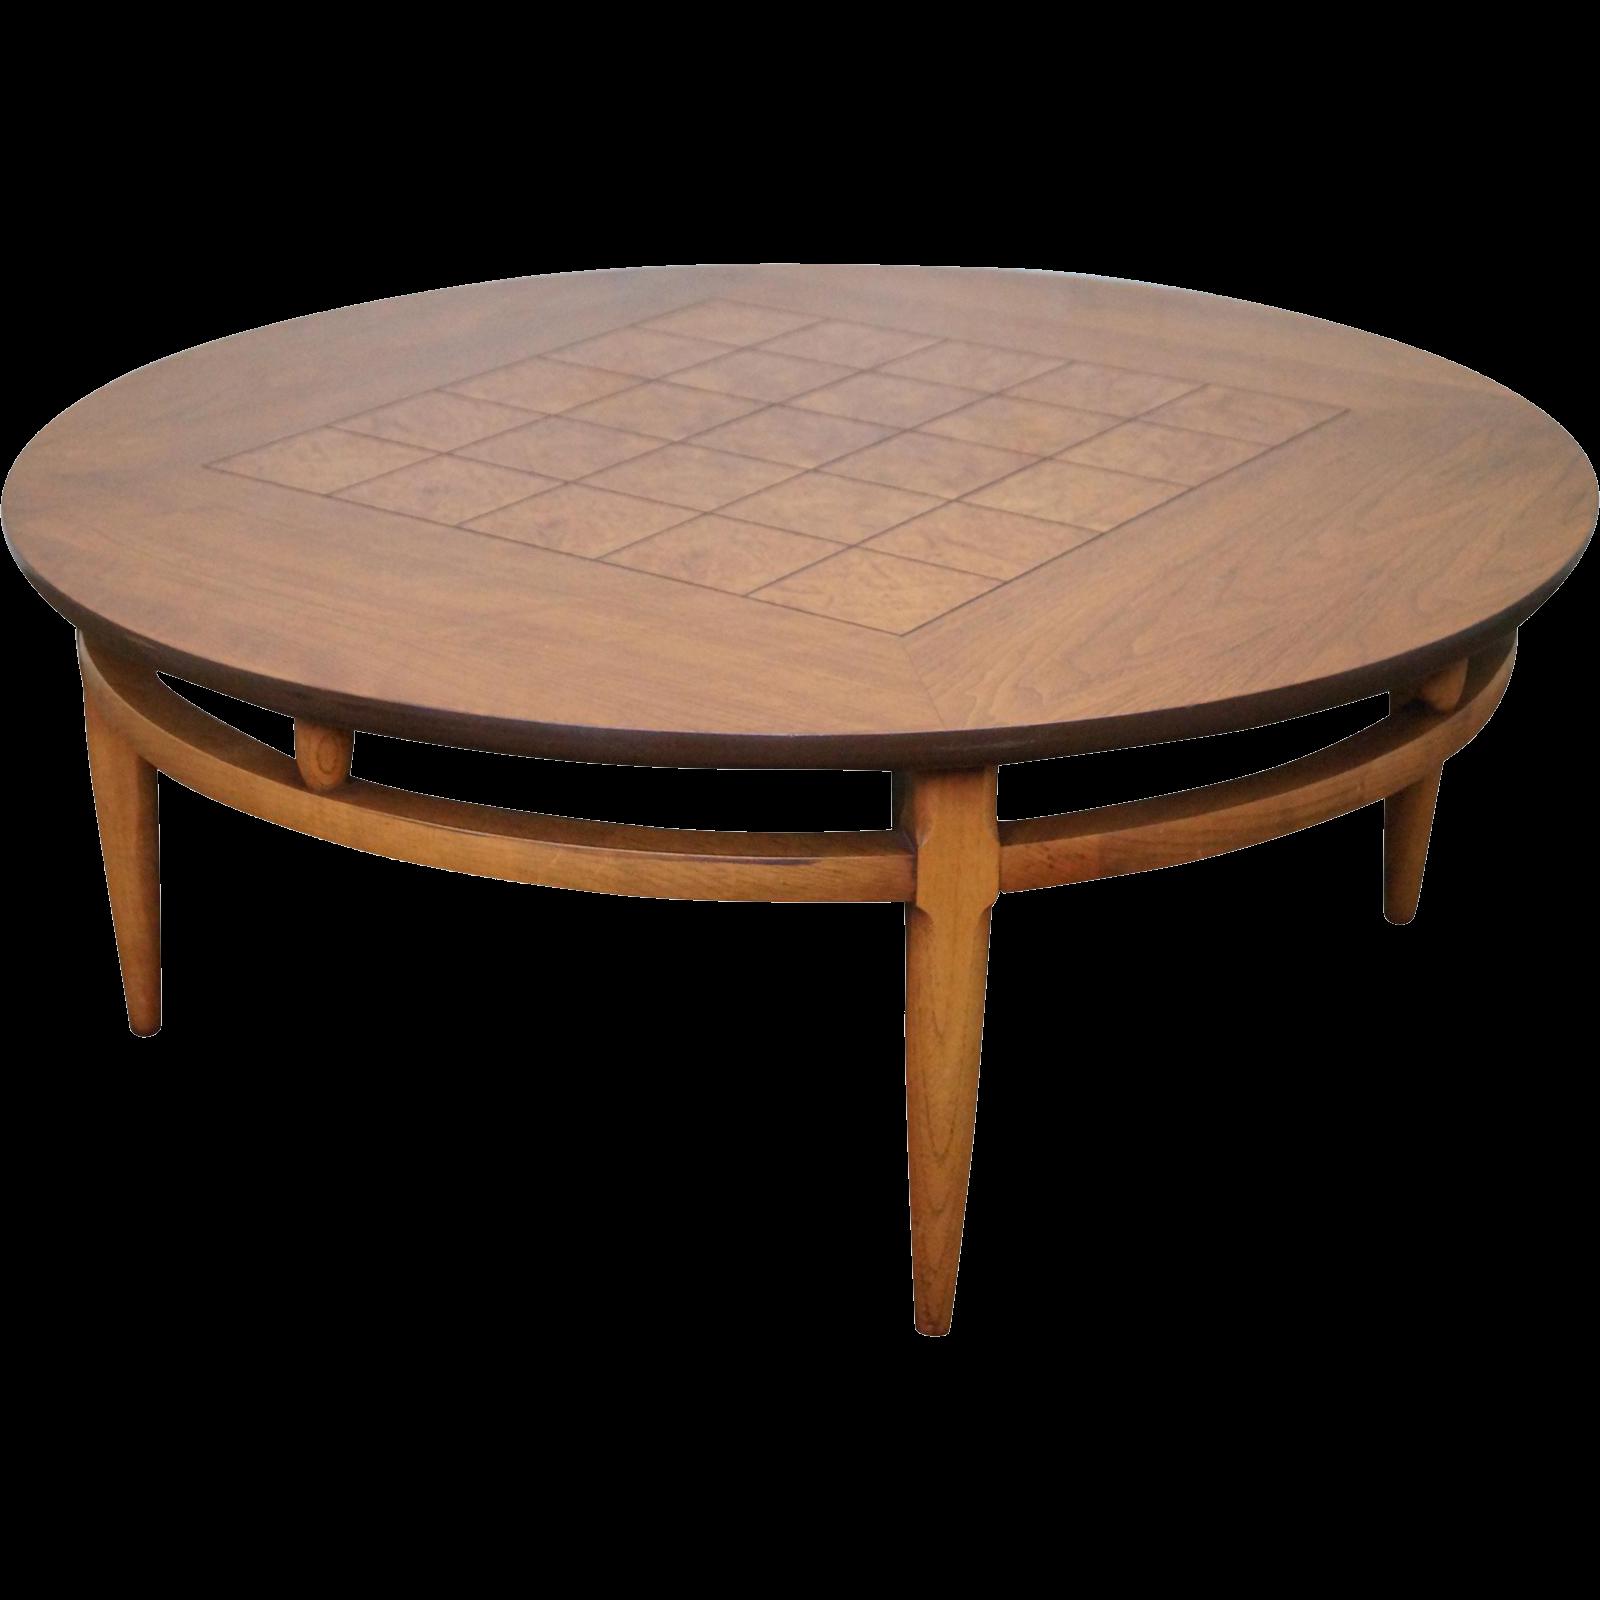 Lane Round Burl Walnut Mid Century Coffee Table From Bucks County